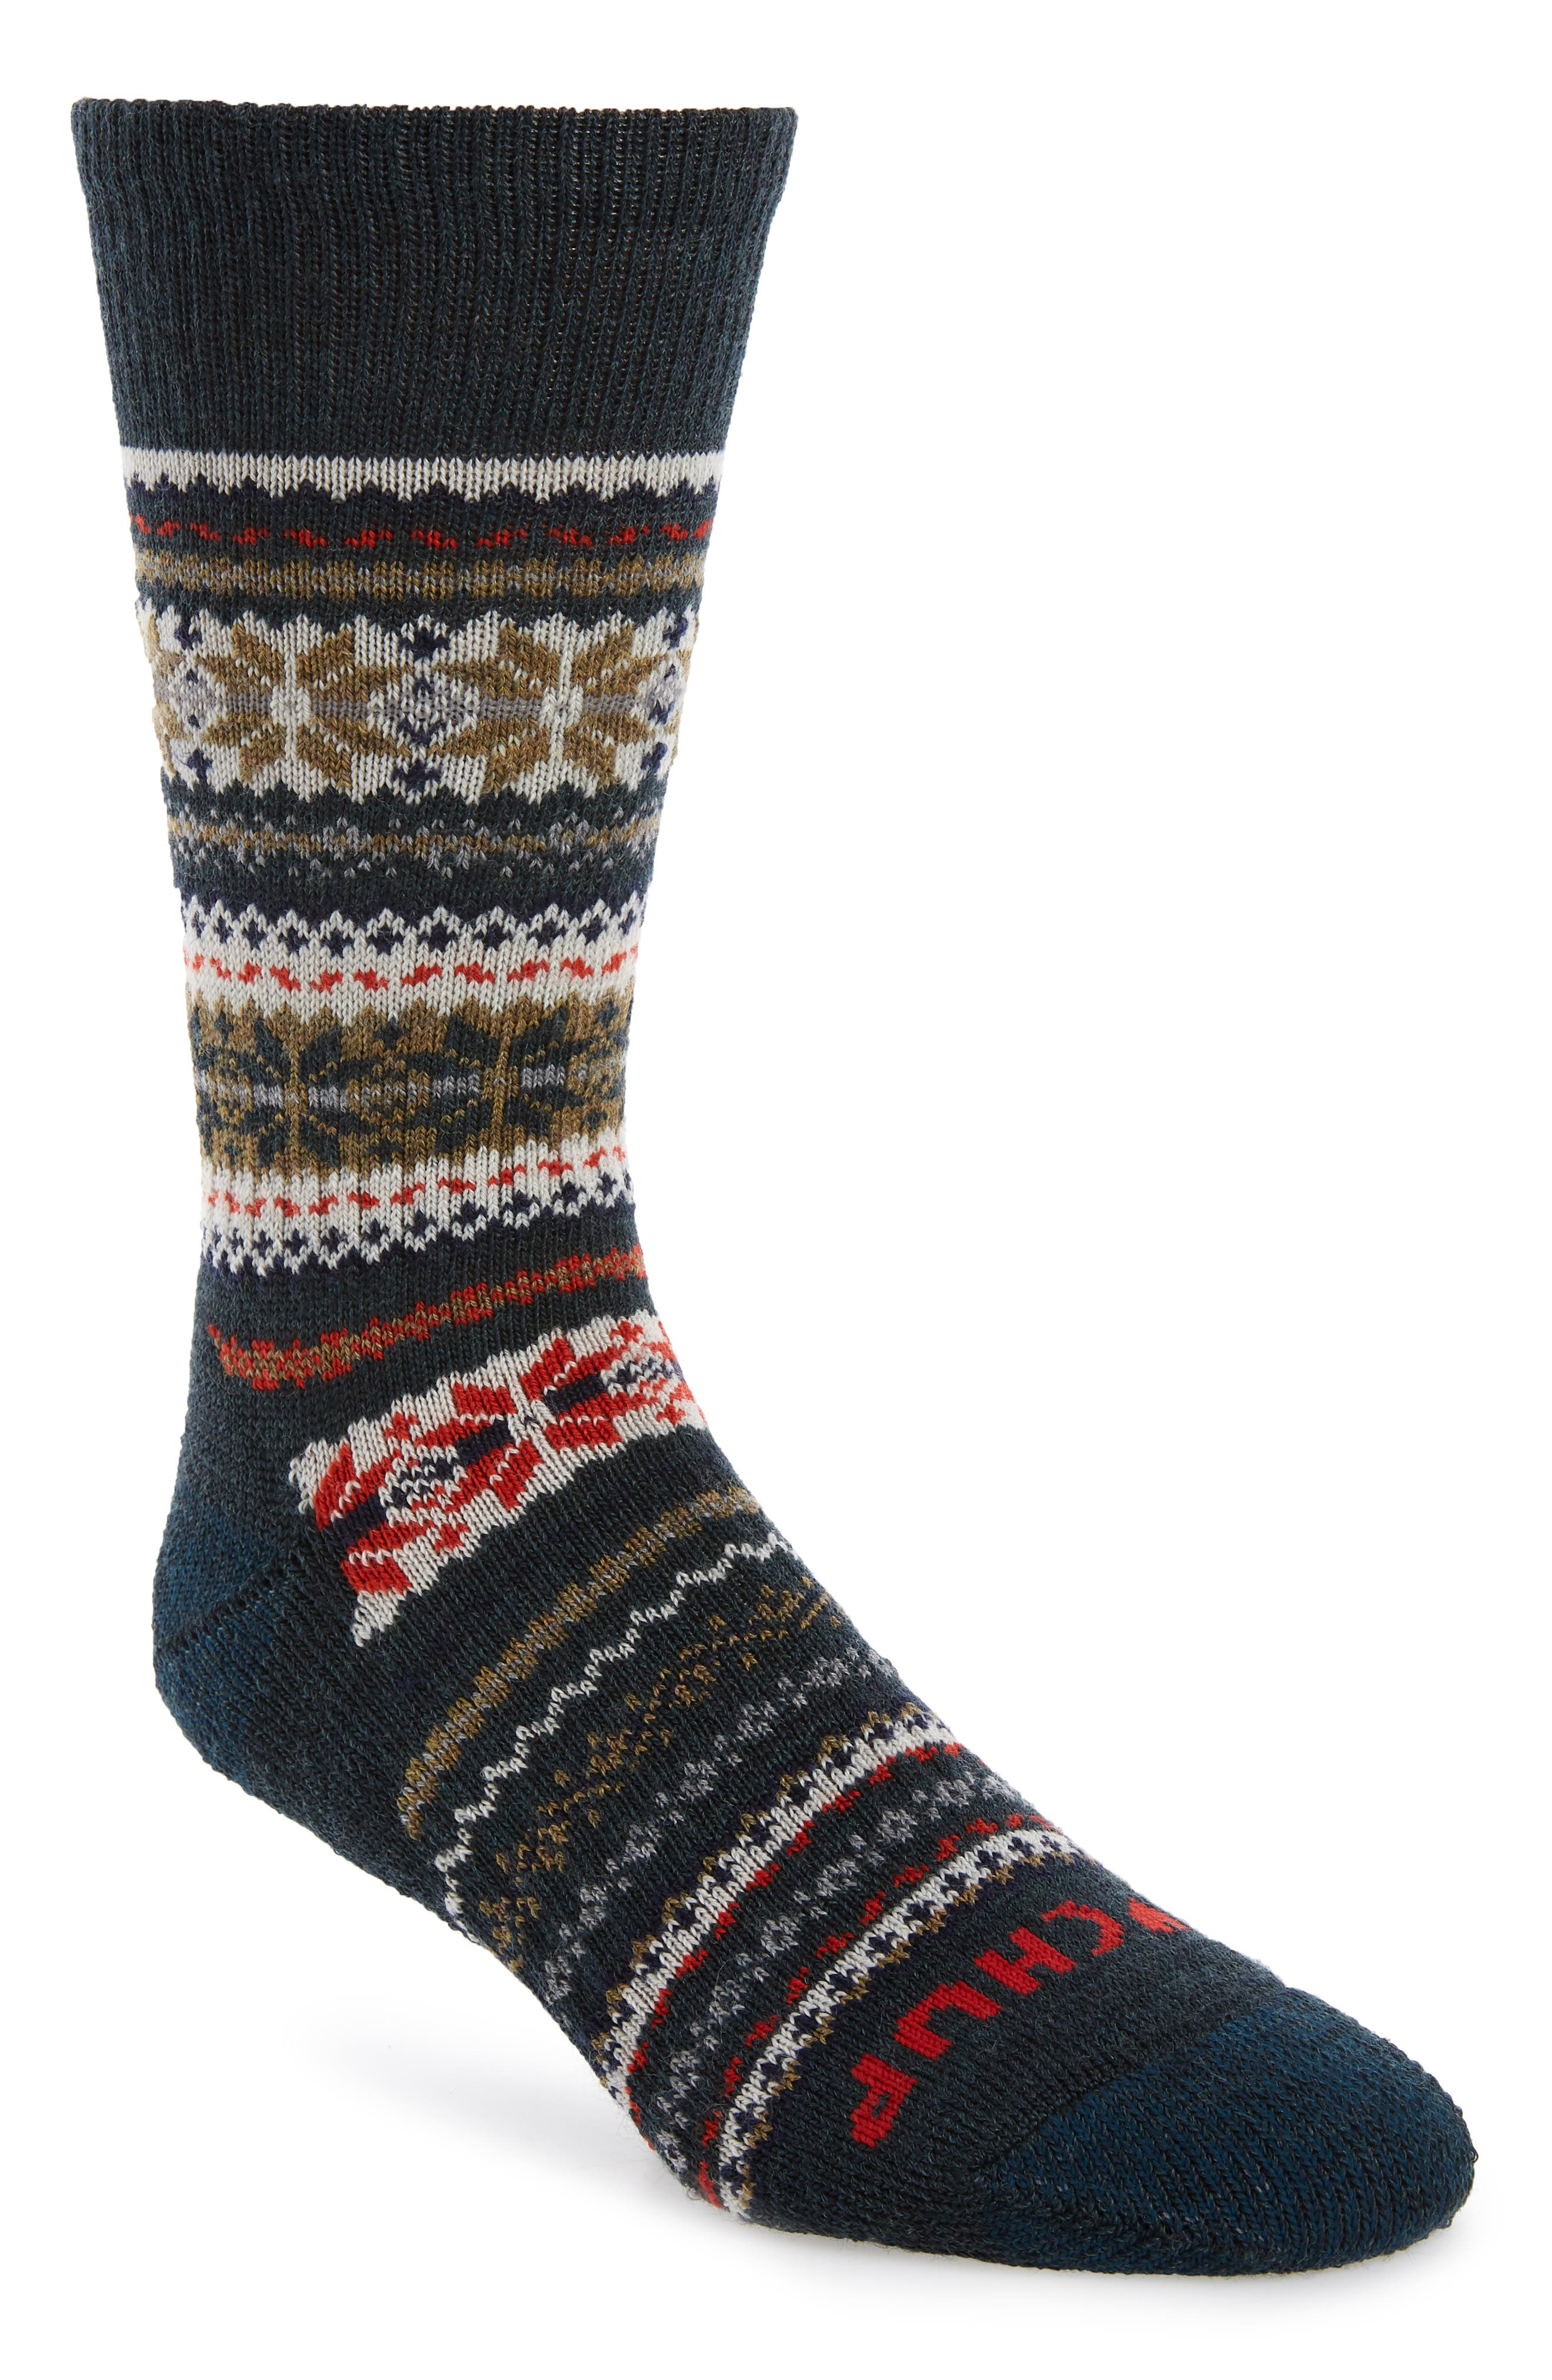 SMARTWOOL x CHUP Snowflake Socks, Main, color, 050